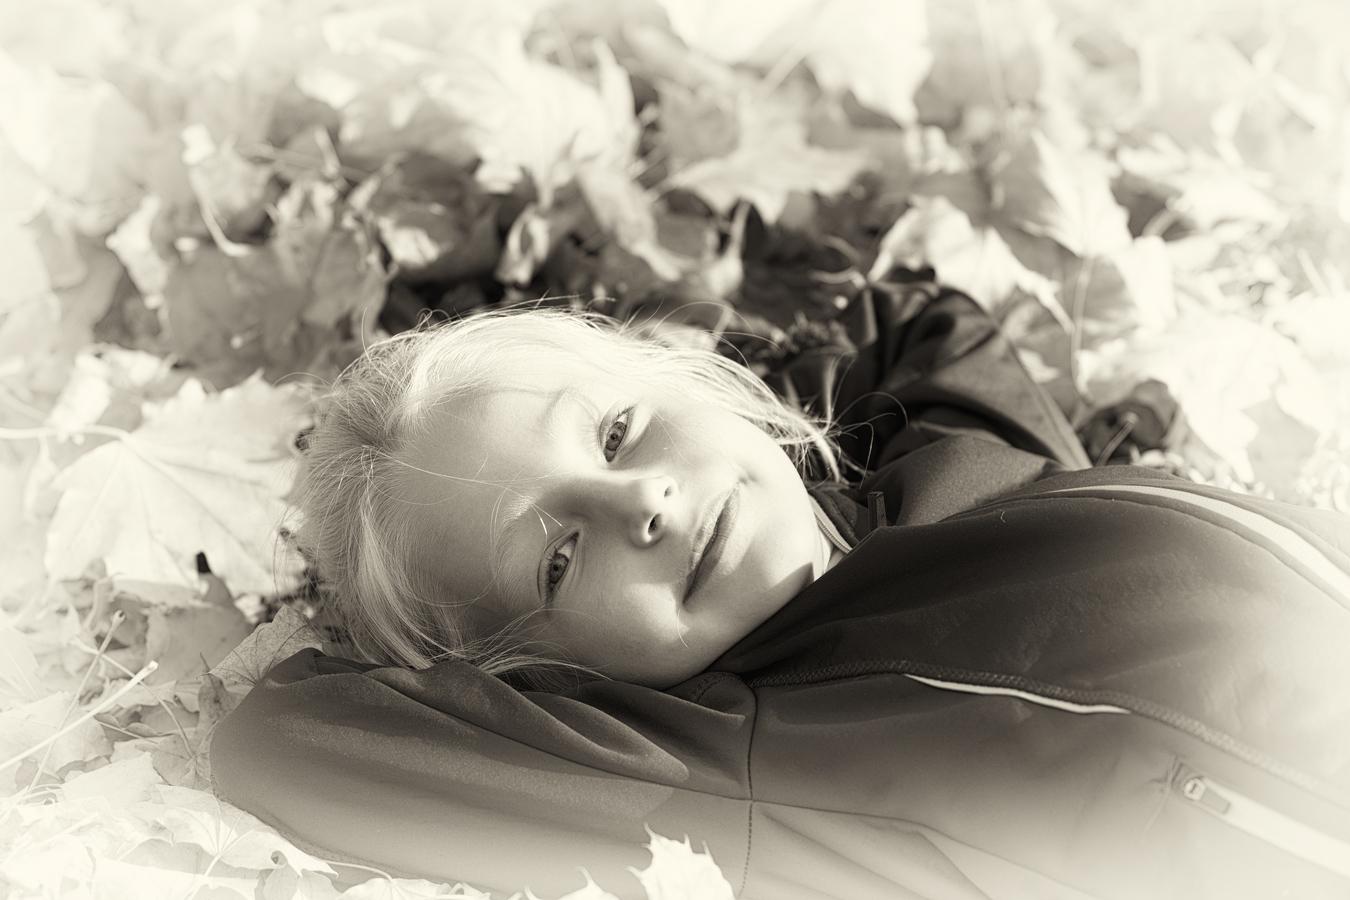 Princezna v černobílé